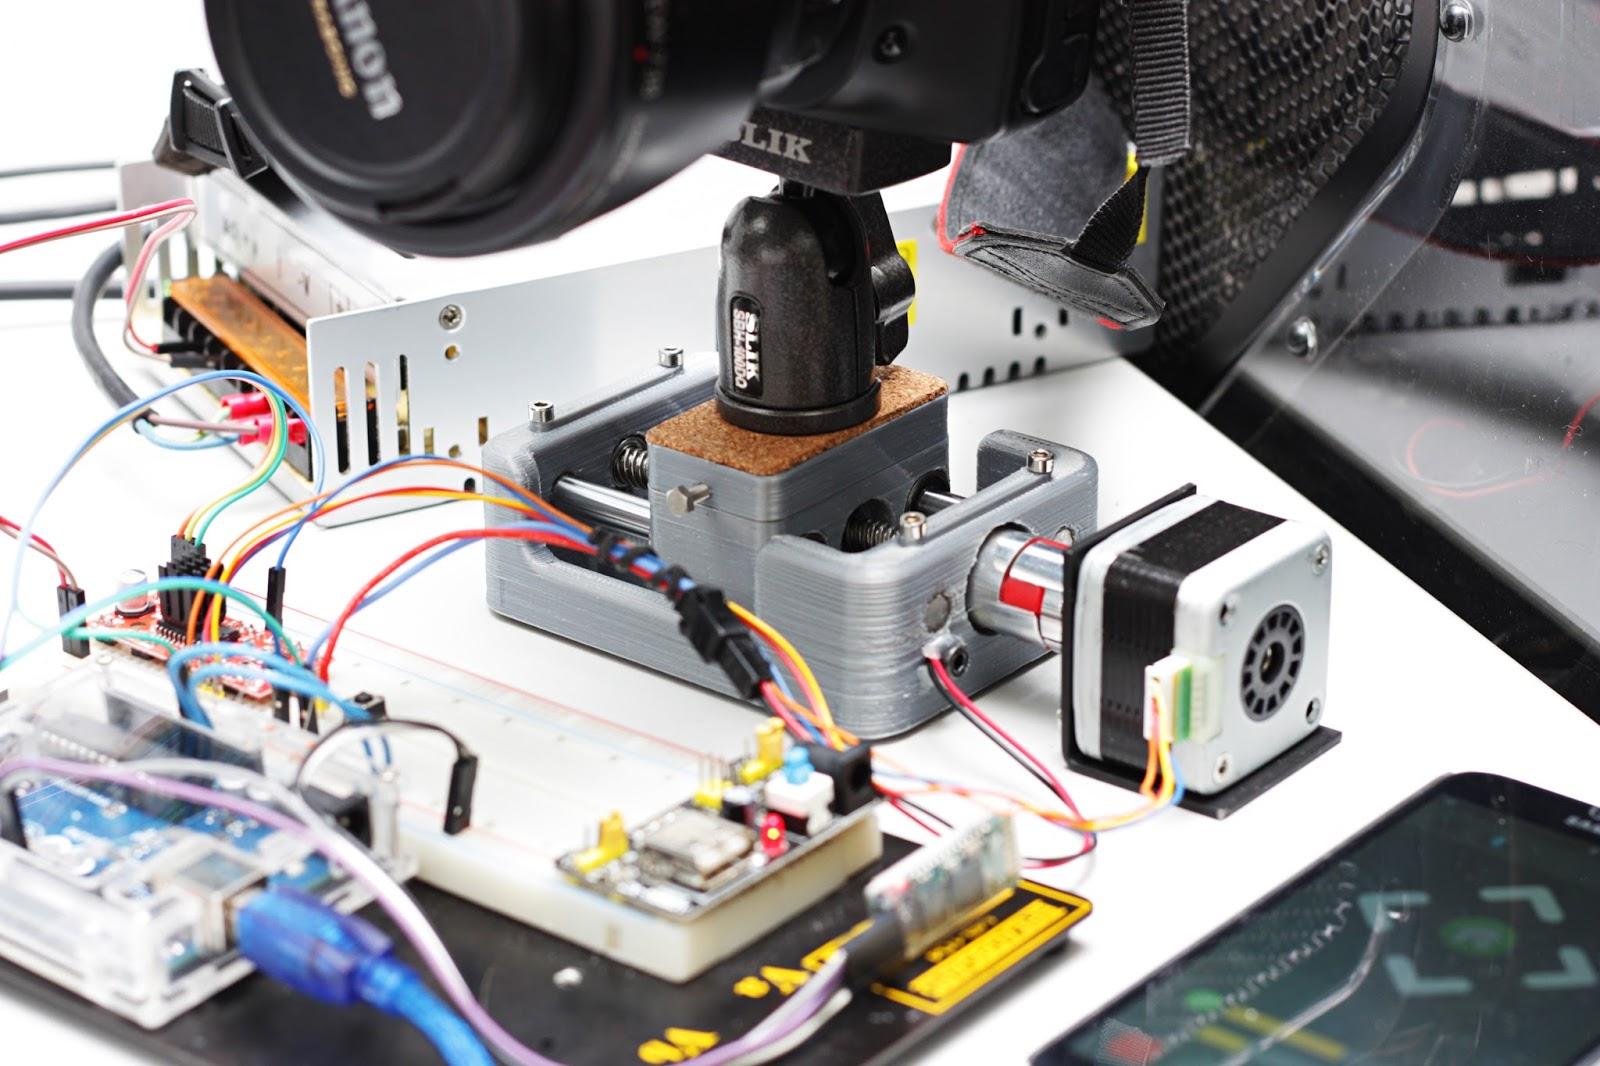 Maker arduino motion control camera slider andriod